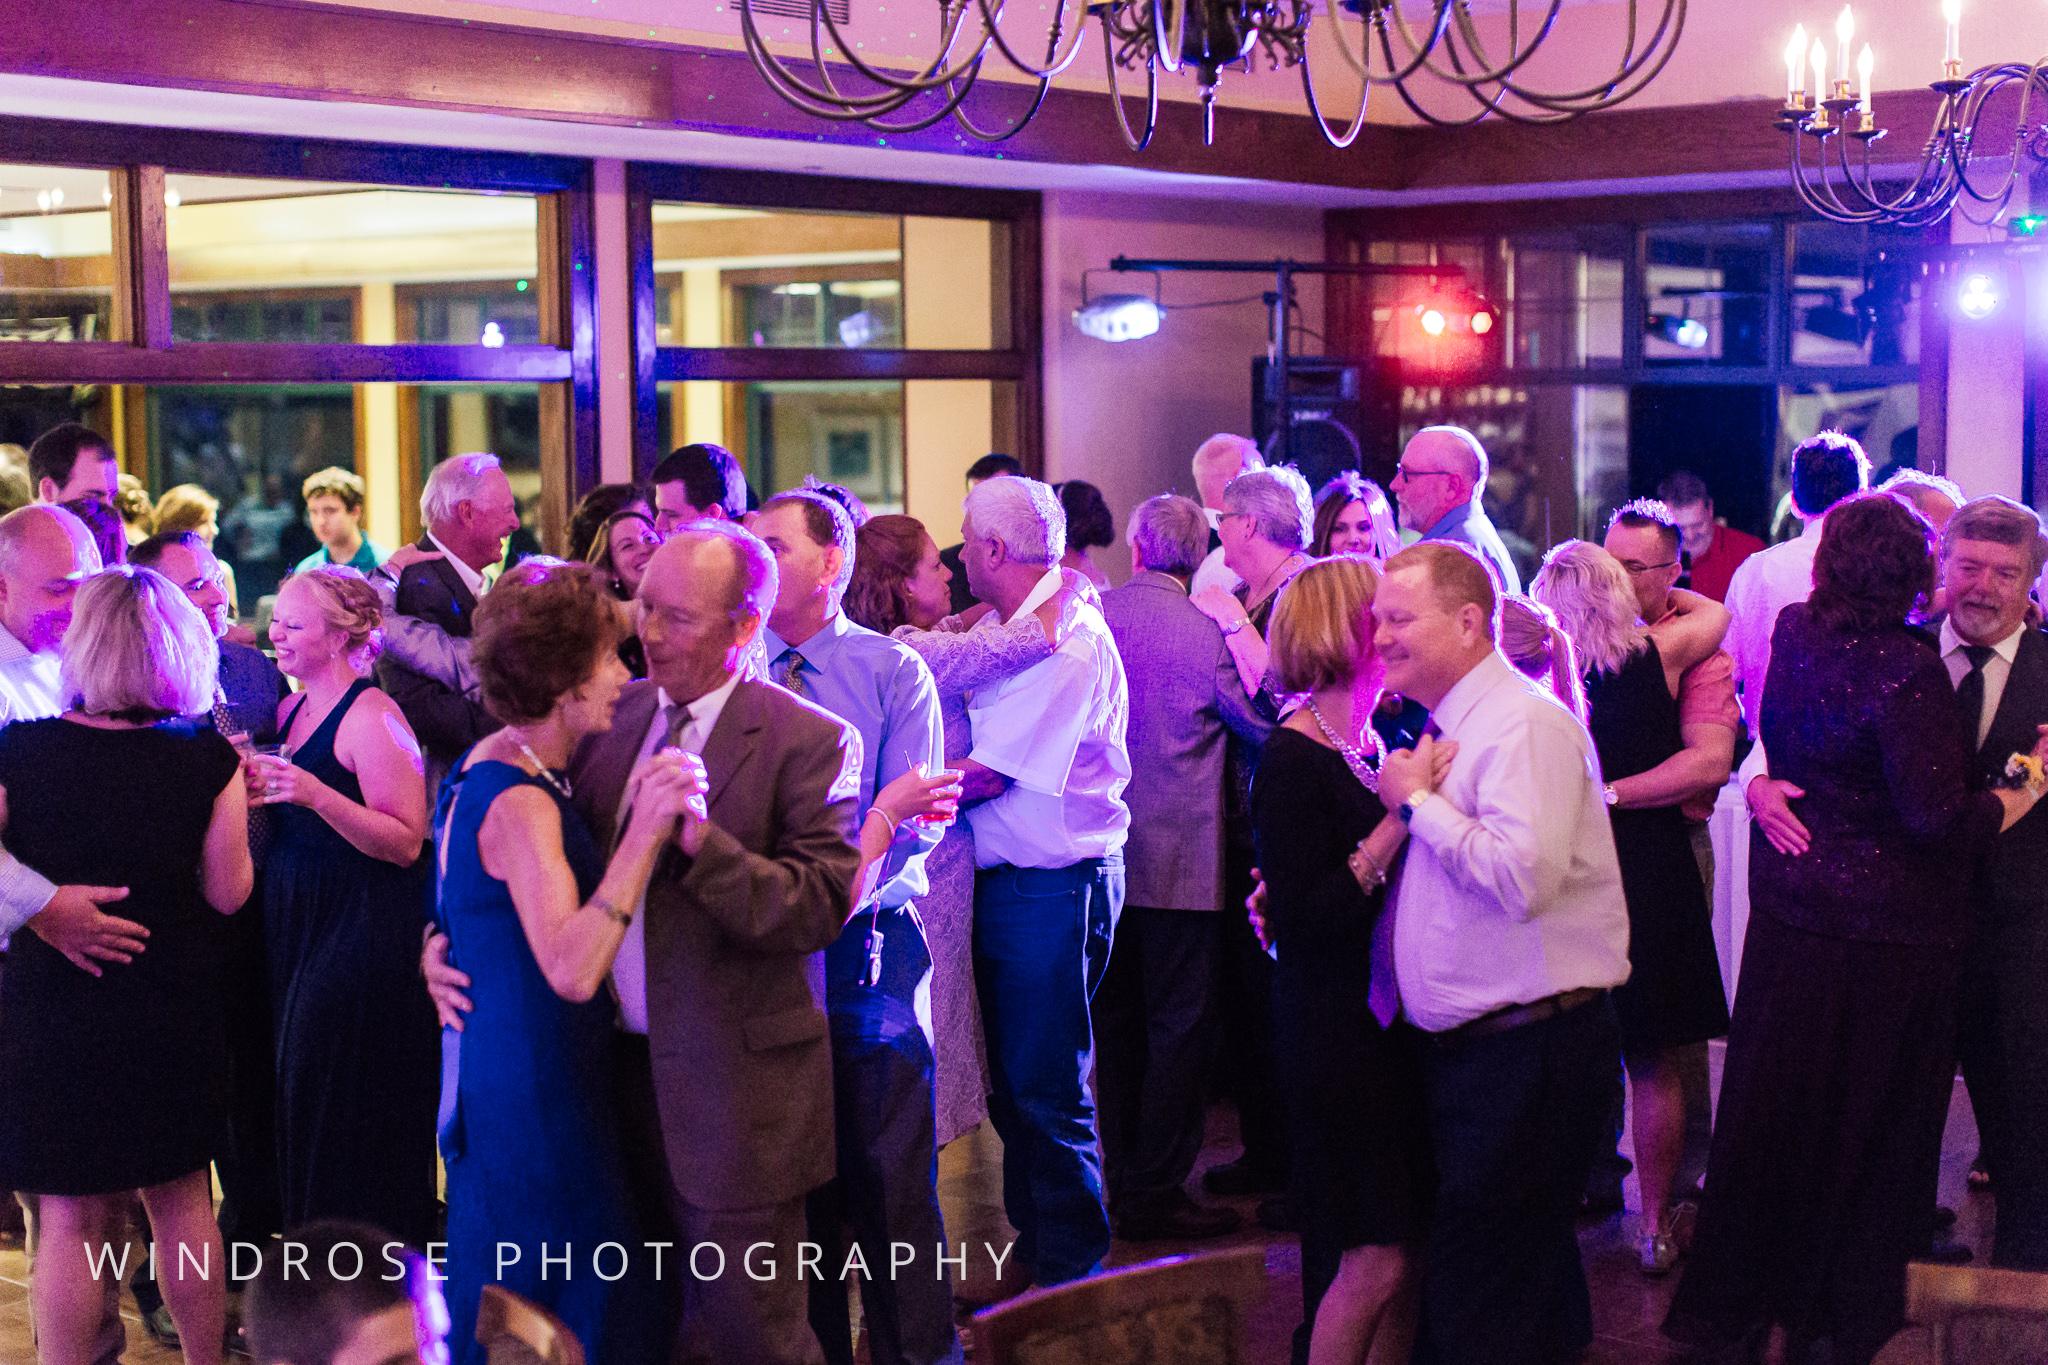 La-Crosse-Country-Club-Wedding-Minnesota-Wedding-Photographer-48.jpg